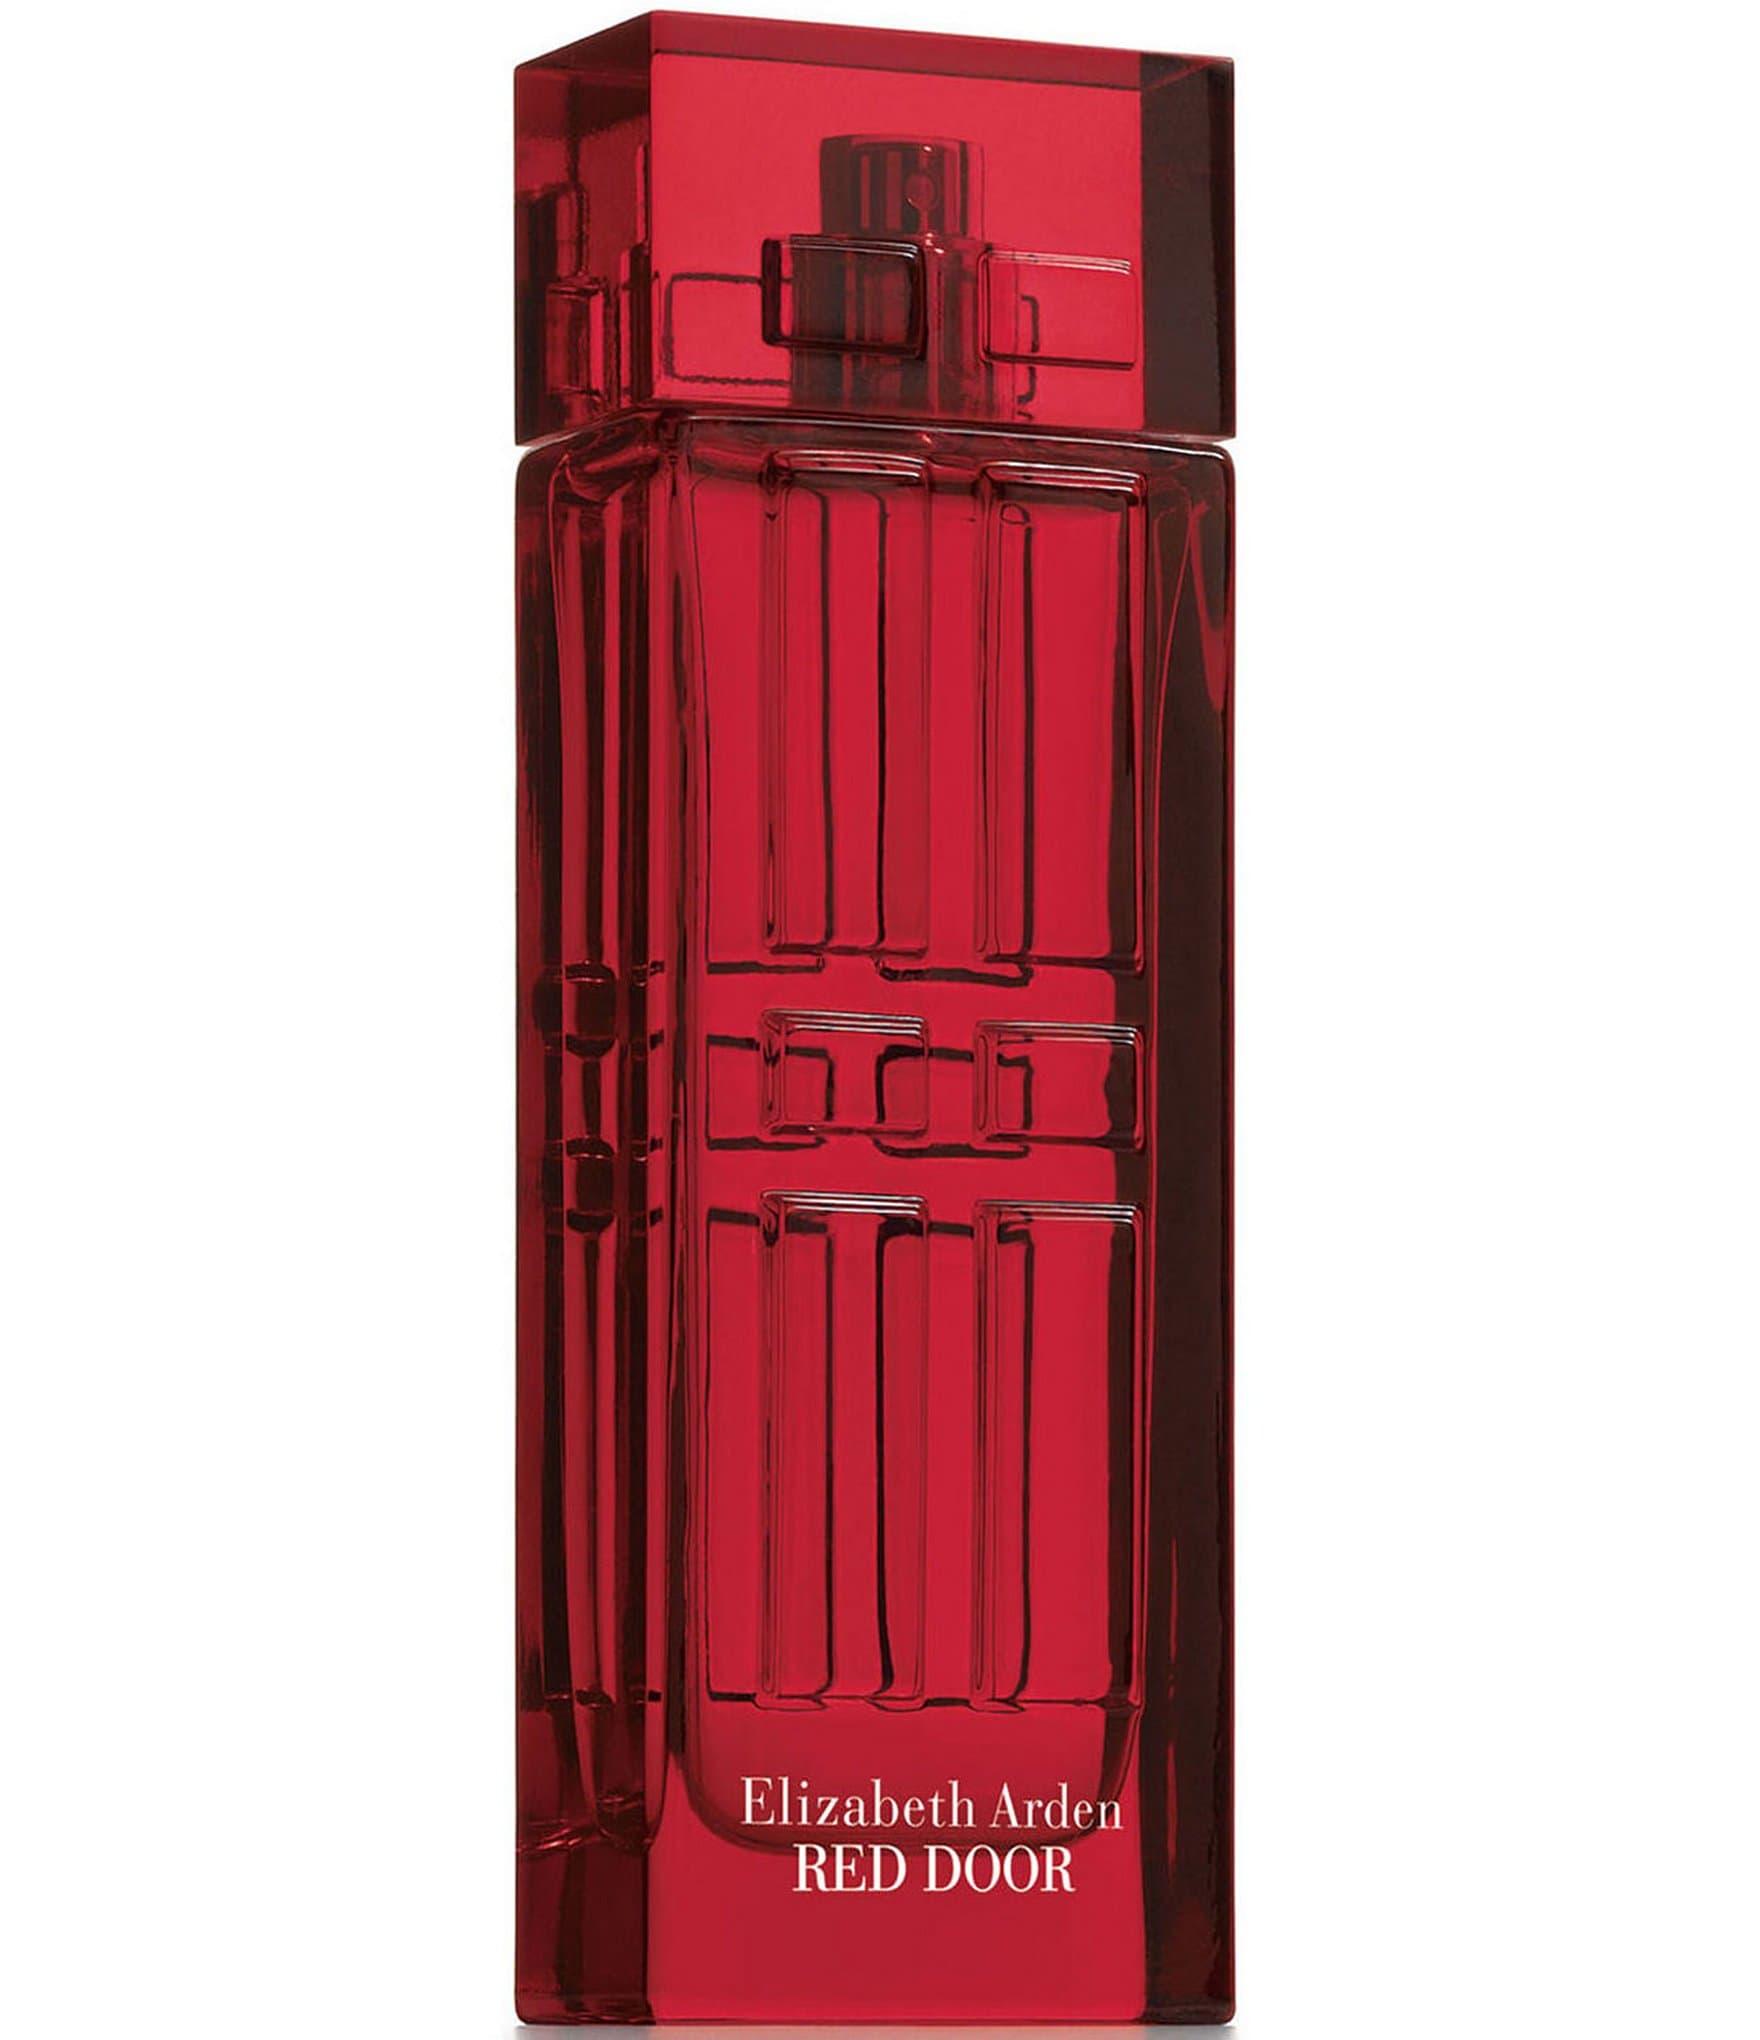 Elizabeth Arden Fragrances For Women Men Dillards